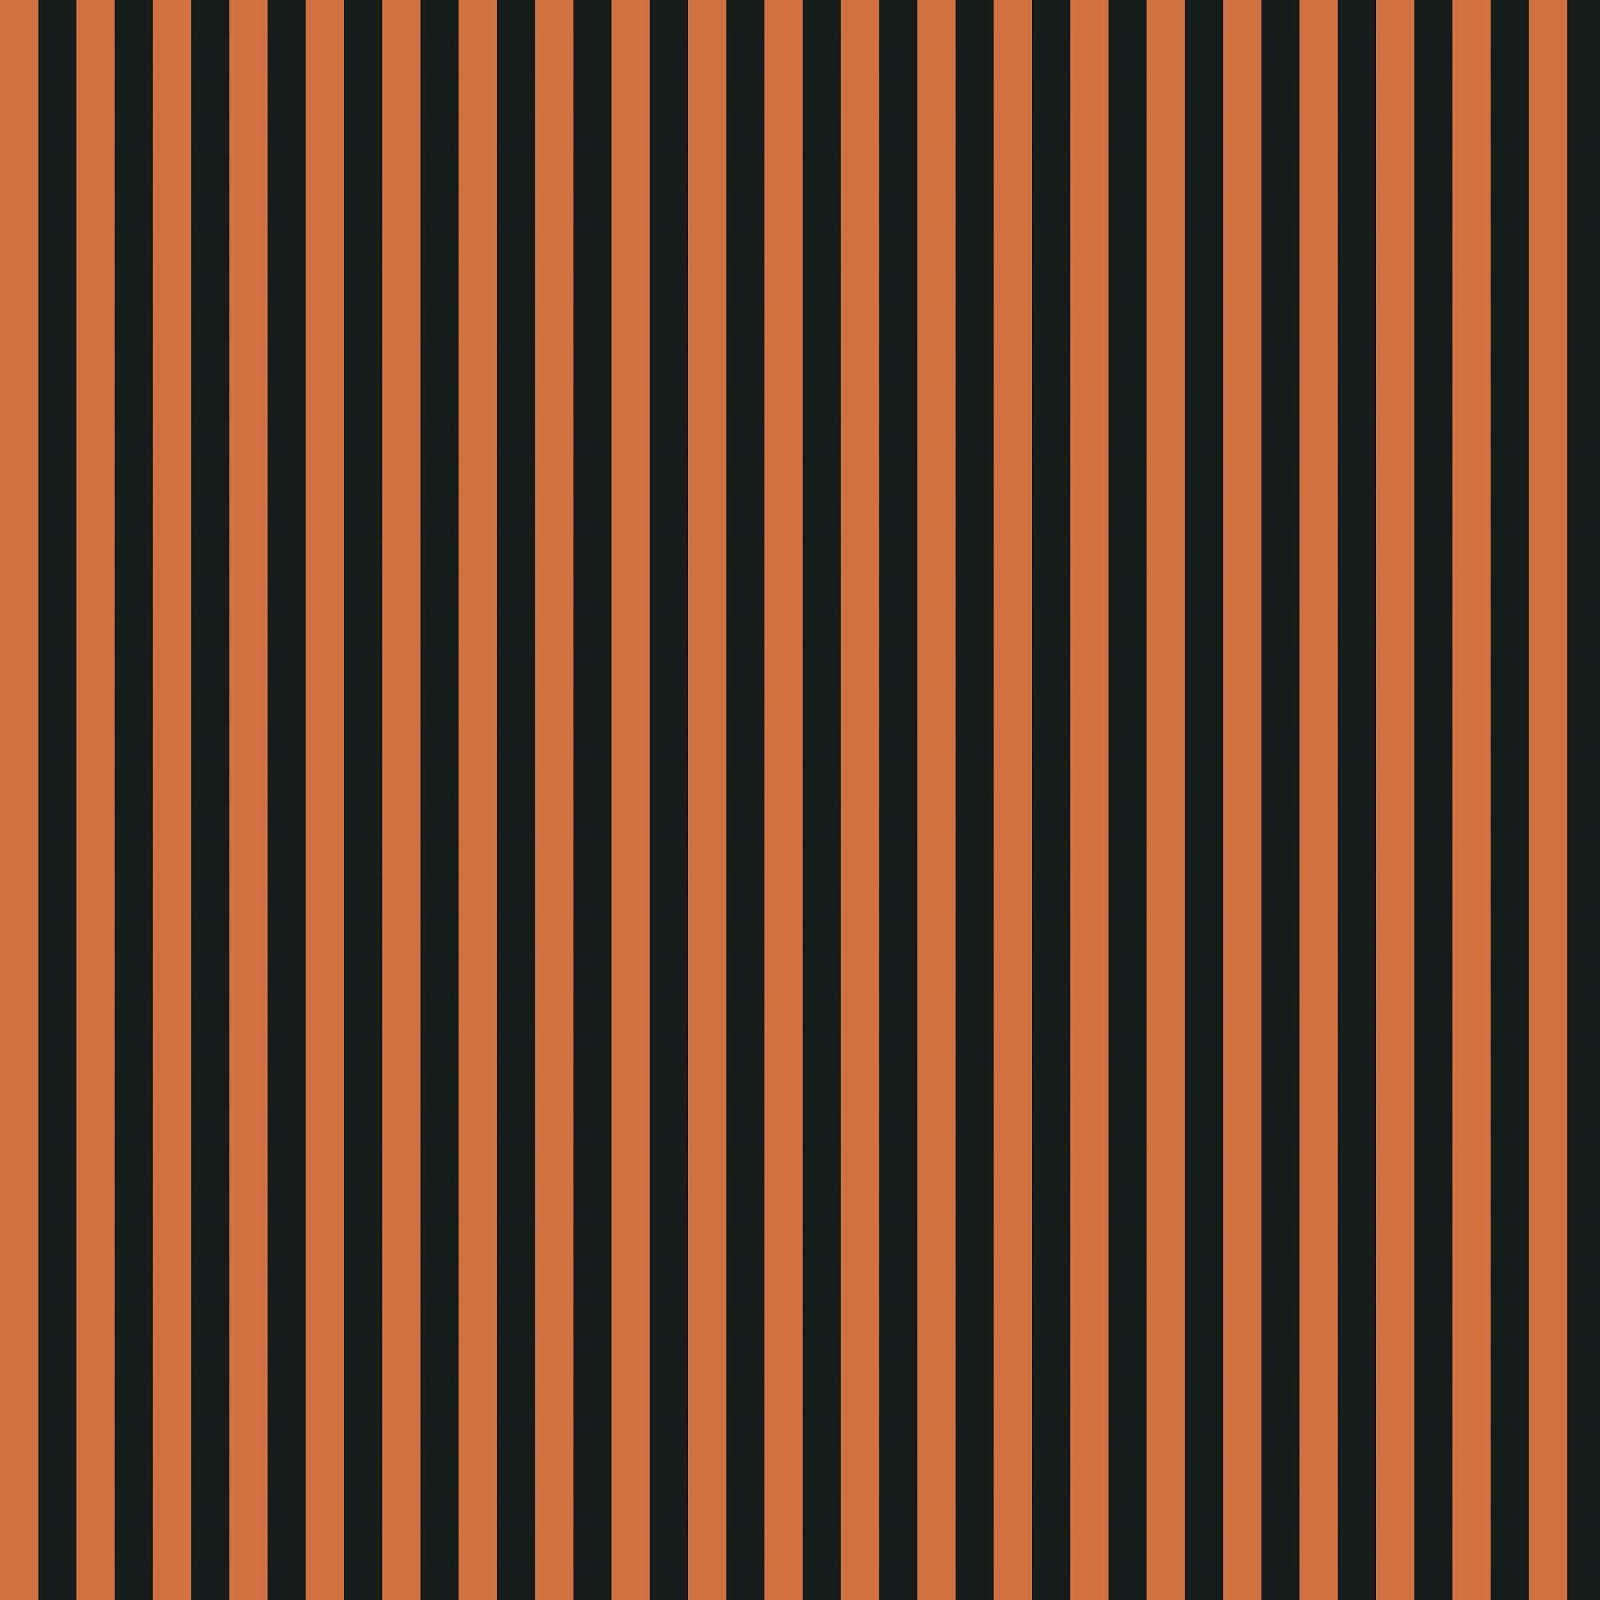 free digital scrapbook paper halloween stripes different variations black and orange stripes black - Black And Orange Halloween